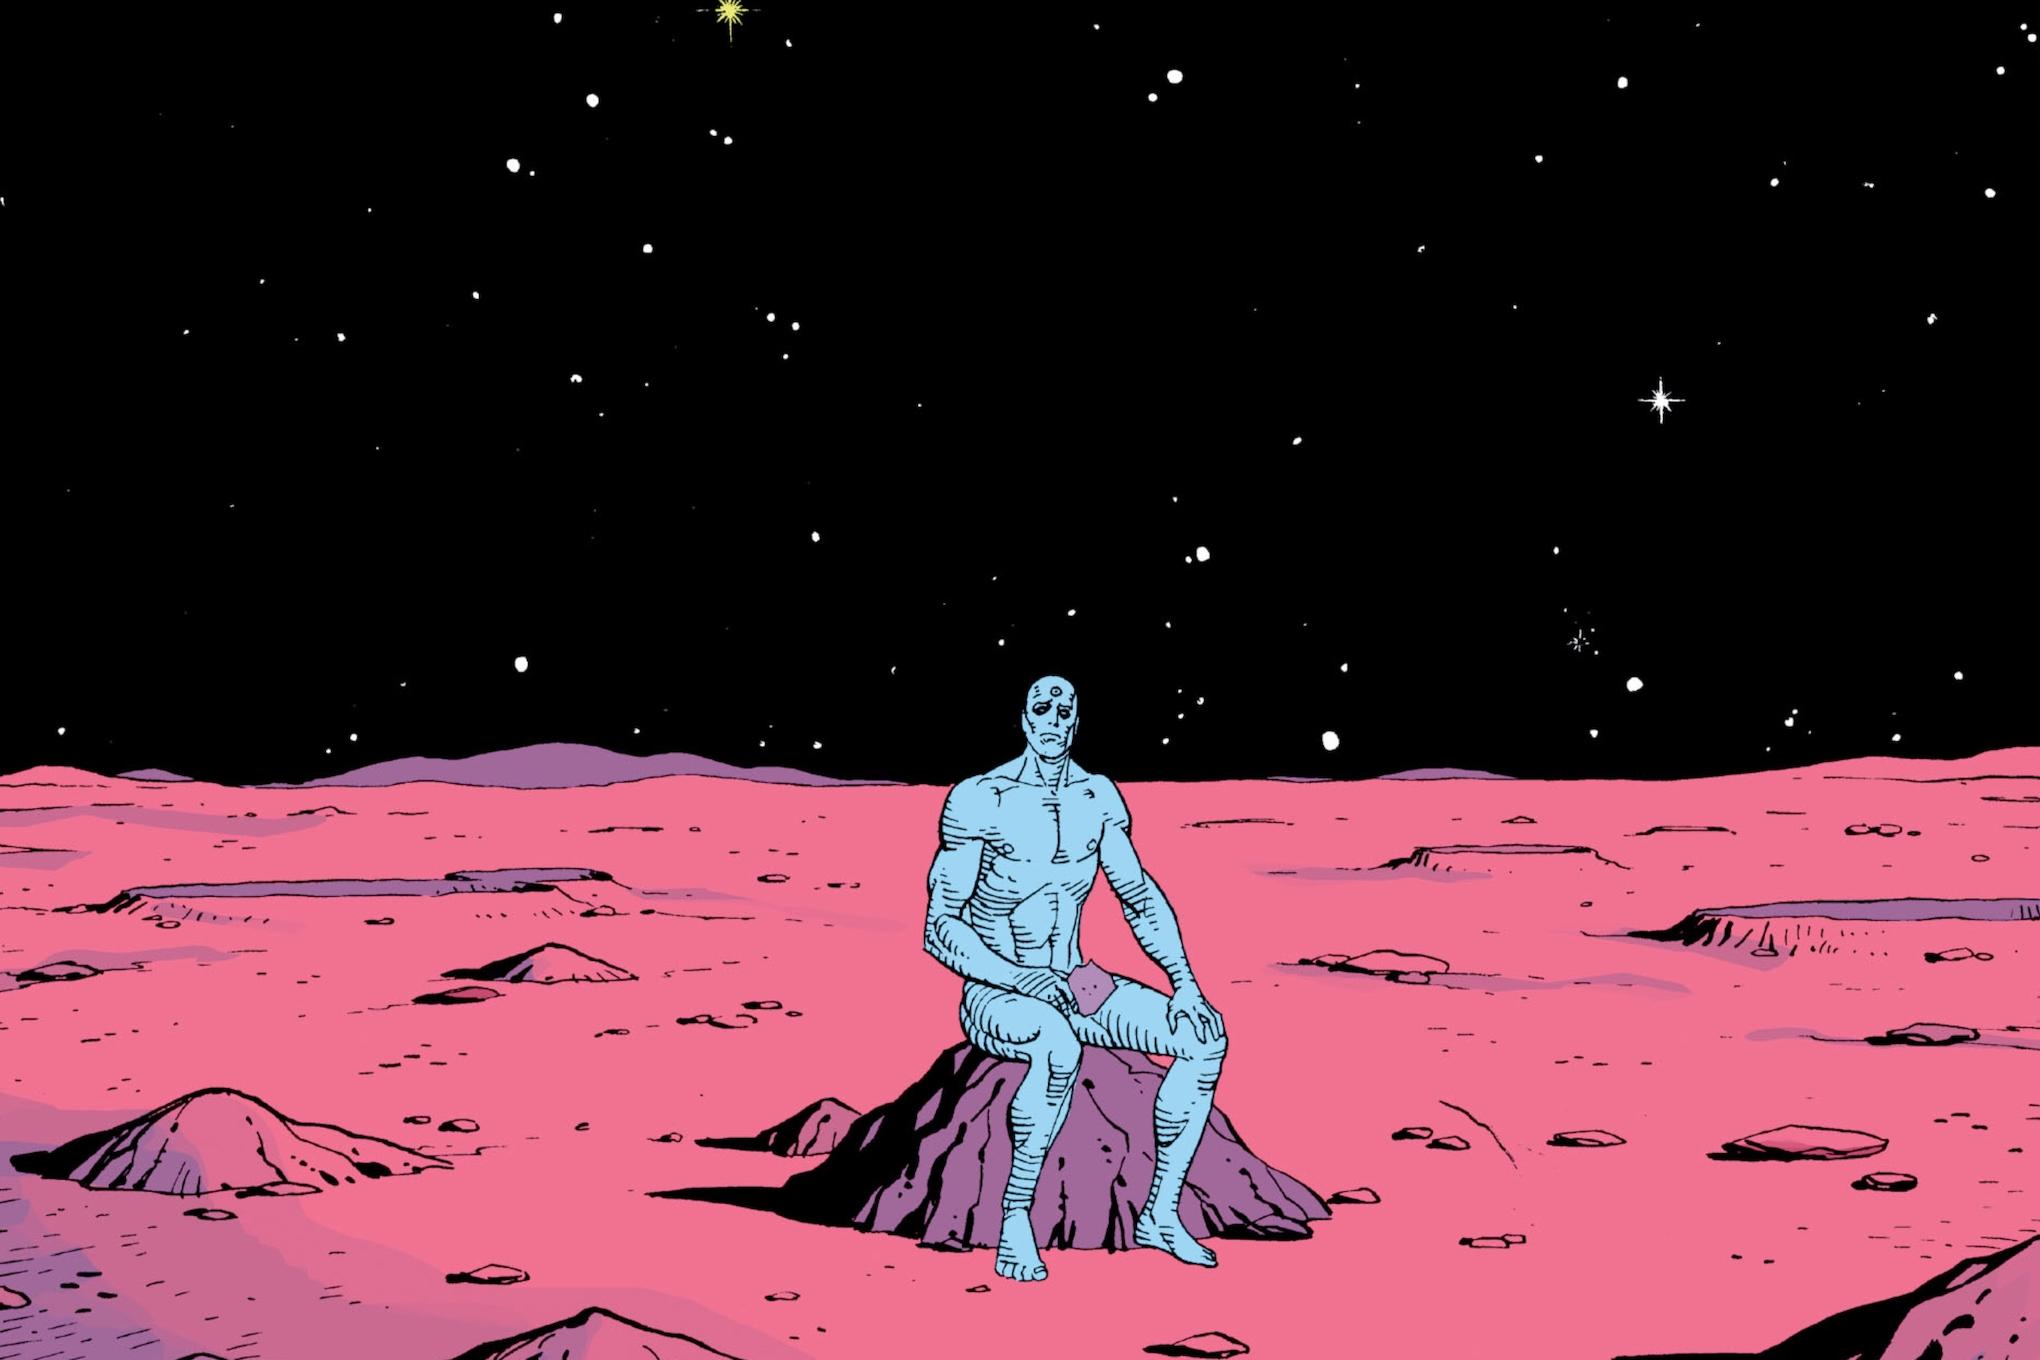 The reason Doctor Manhattan loves Mars